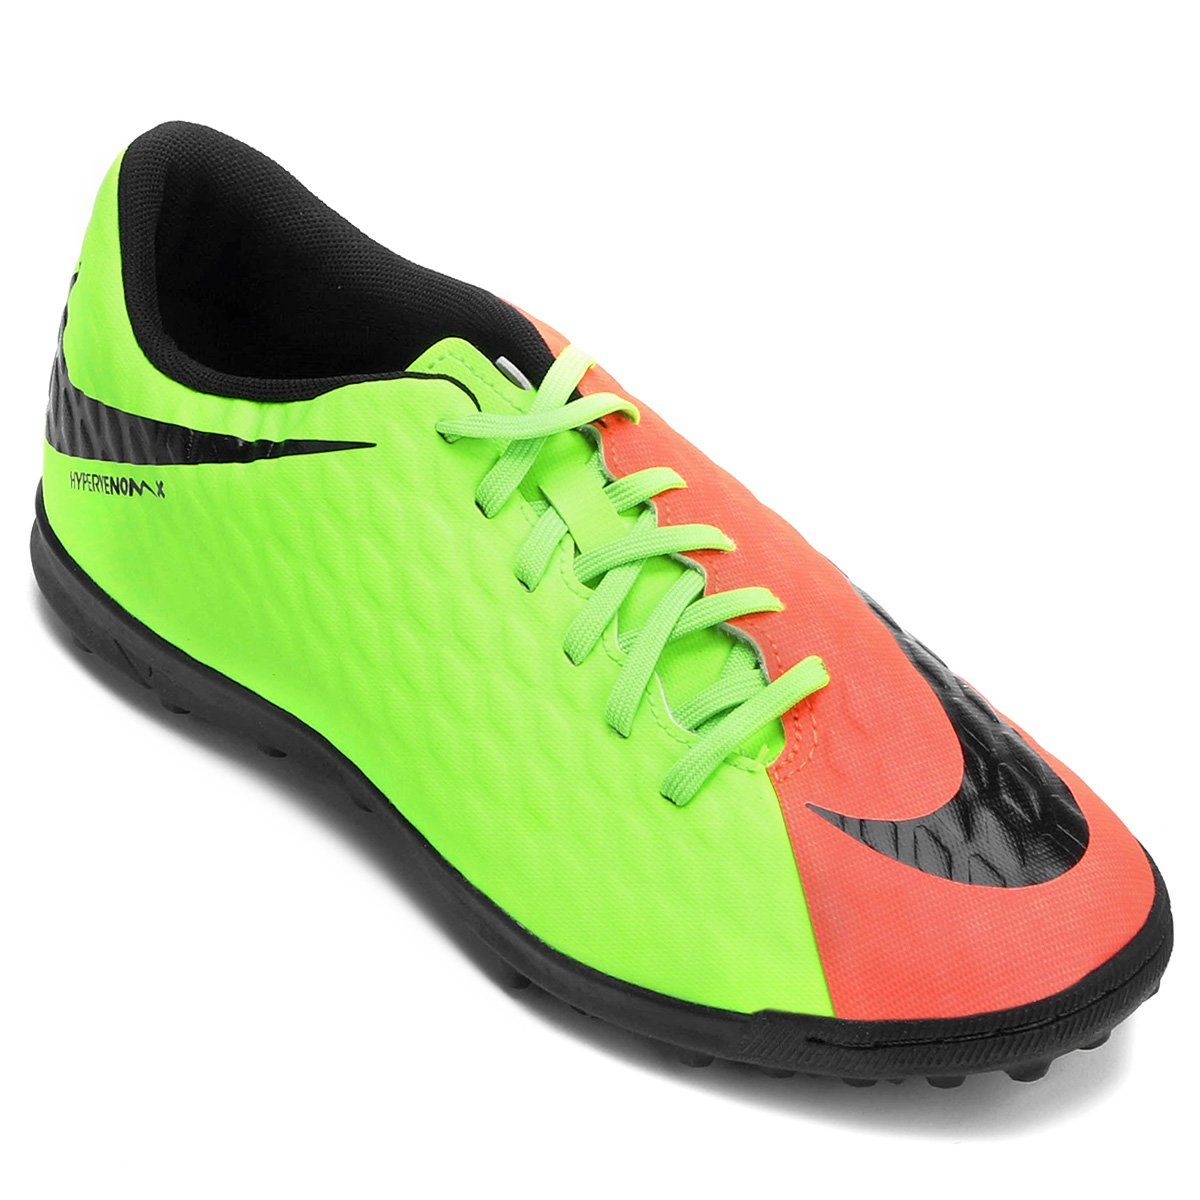 Chuteira Society Nike Hypervenom Phade 3 - Laranja e Verde - Compre ... 04d0b1b5e9e2d